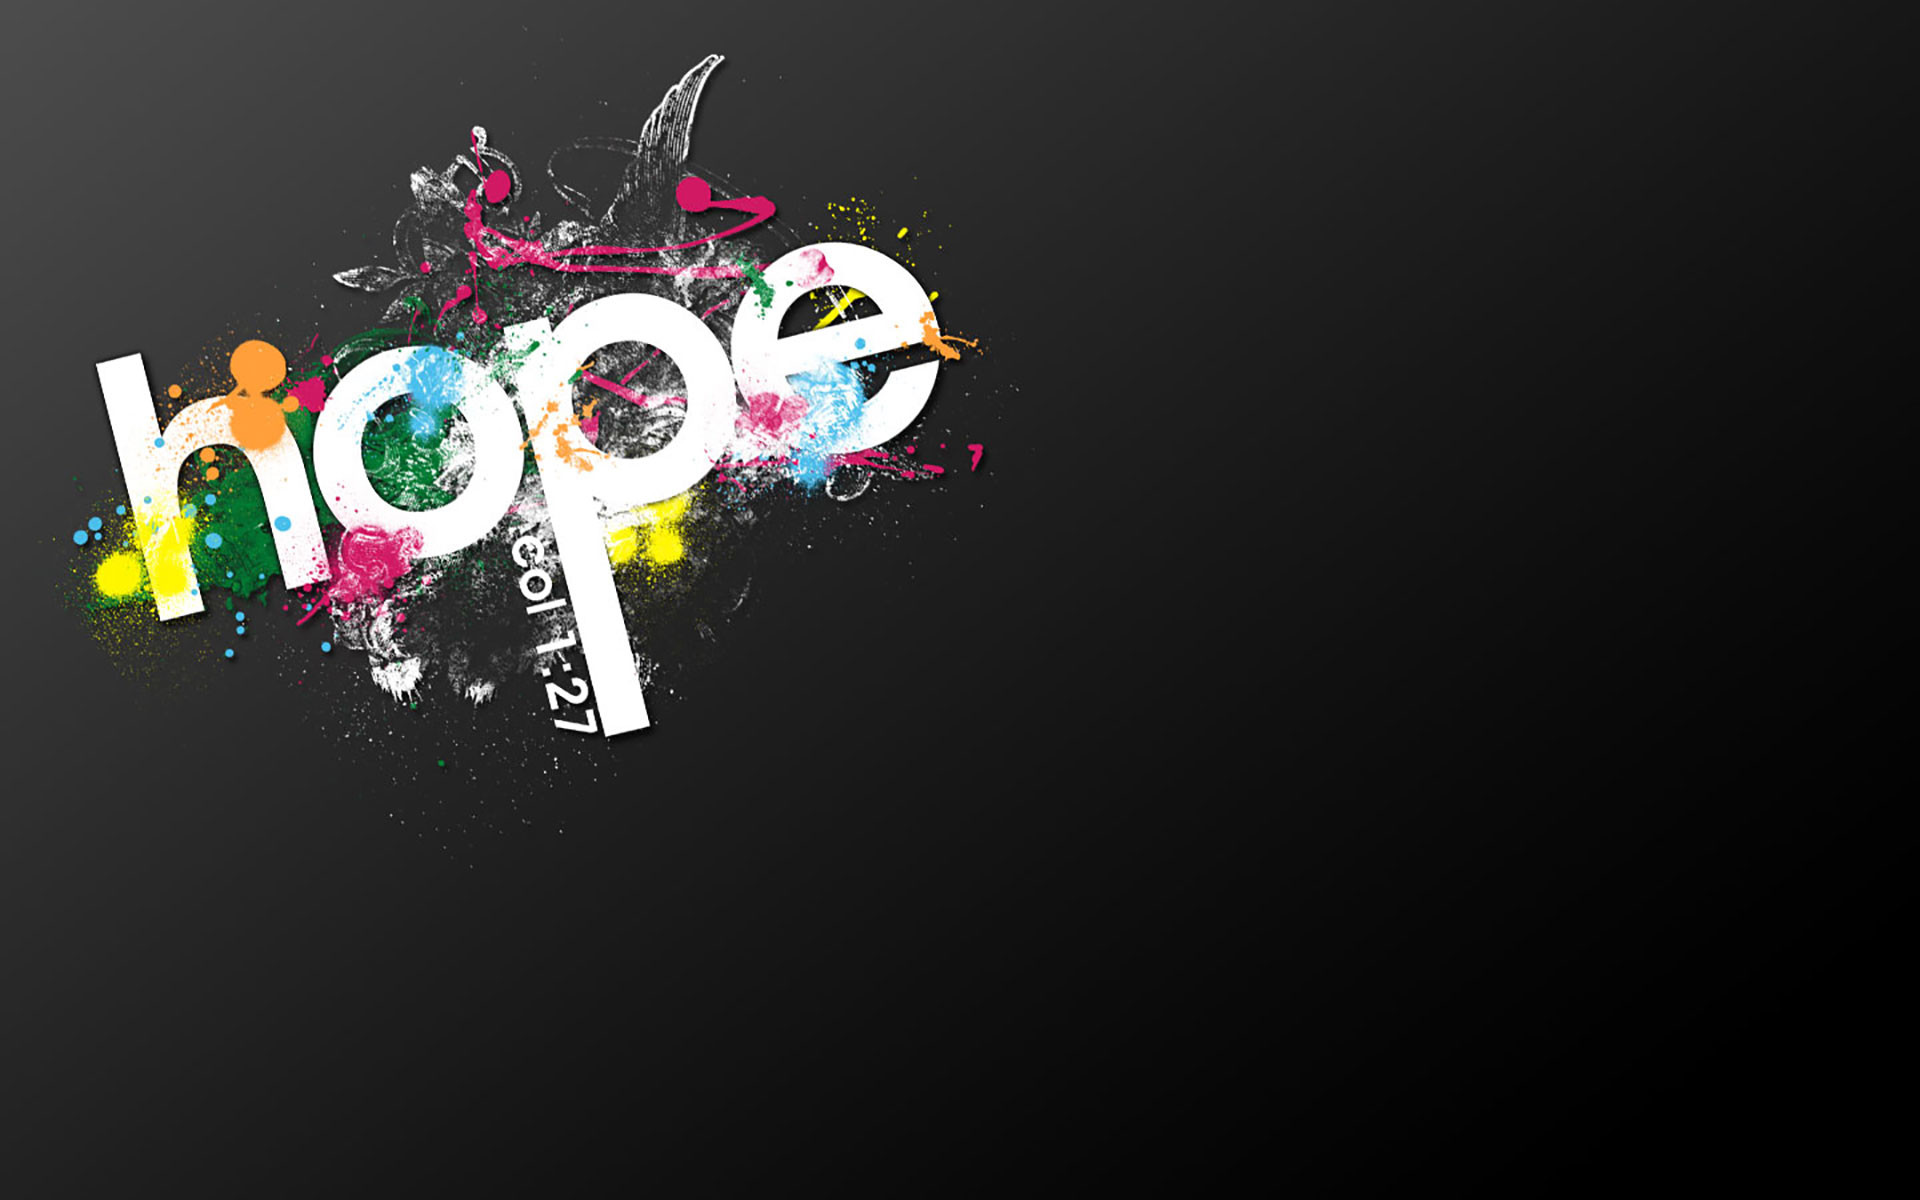 3d Hope Wallpaper